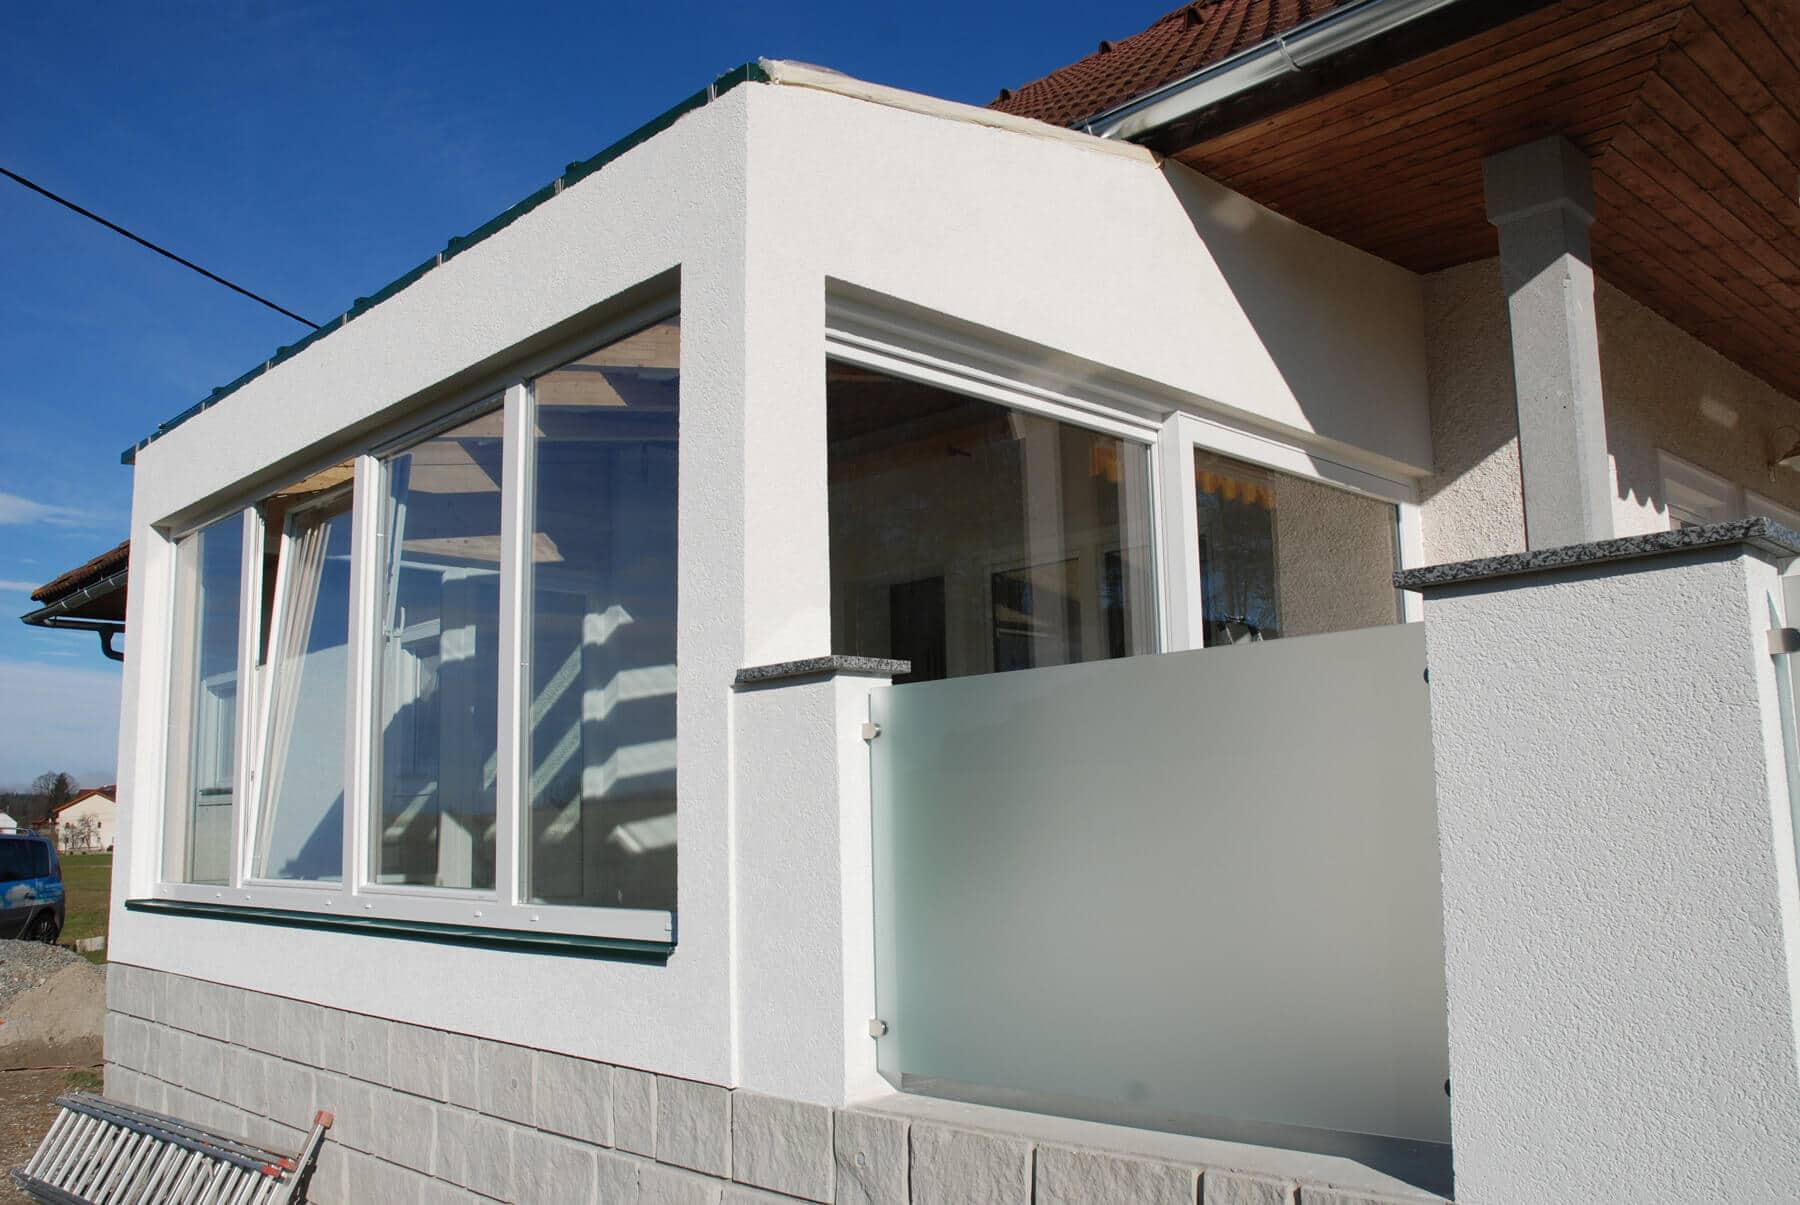 Anbau Holzkonstruktion mit Kunststofffenster